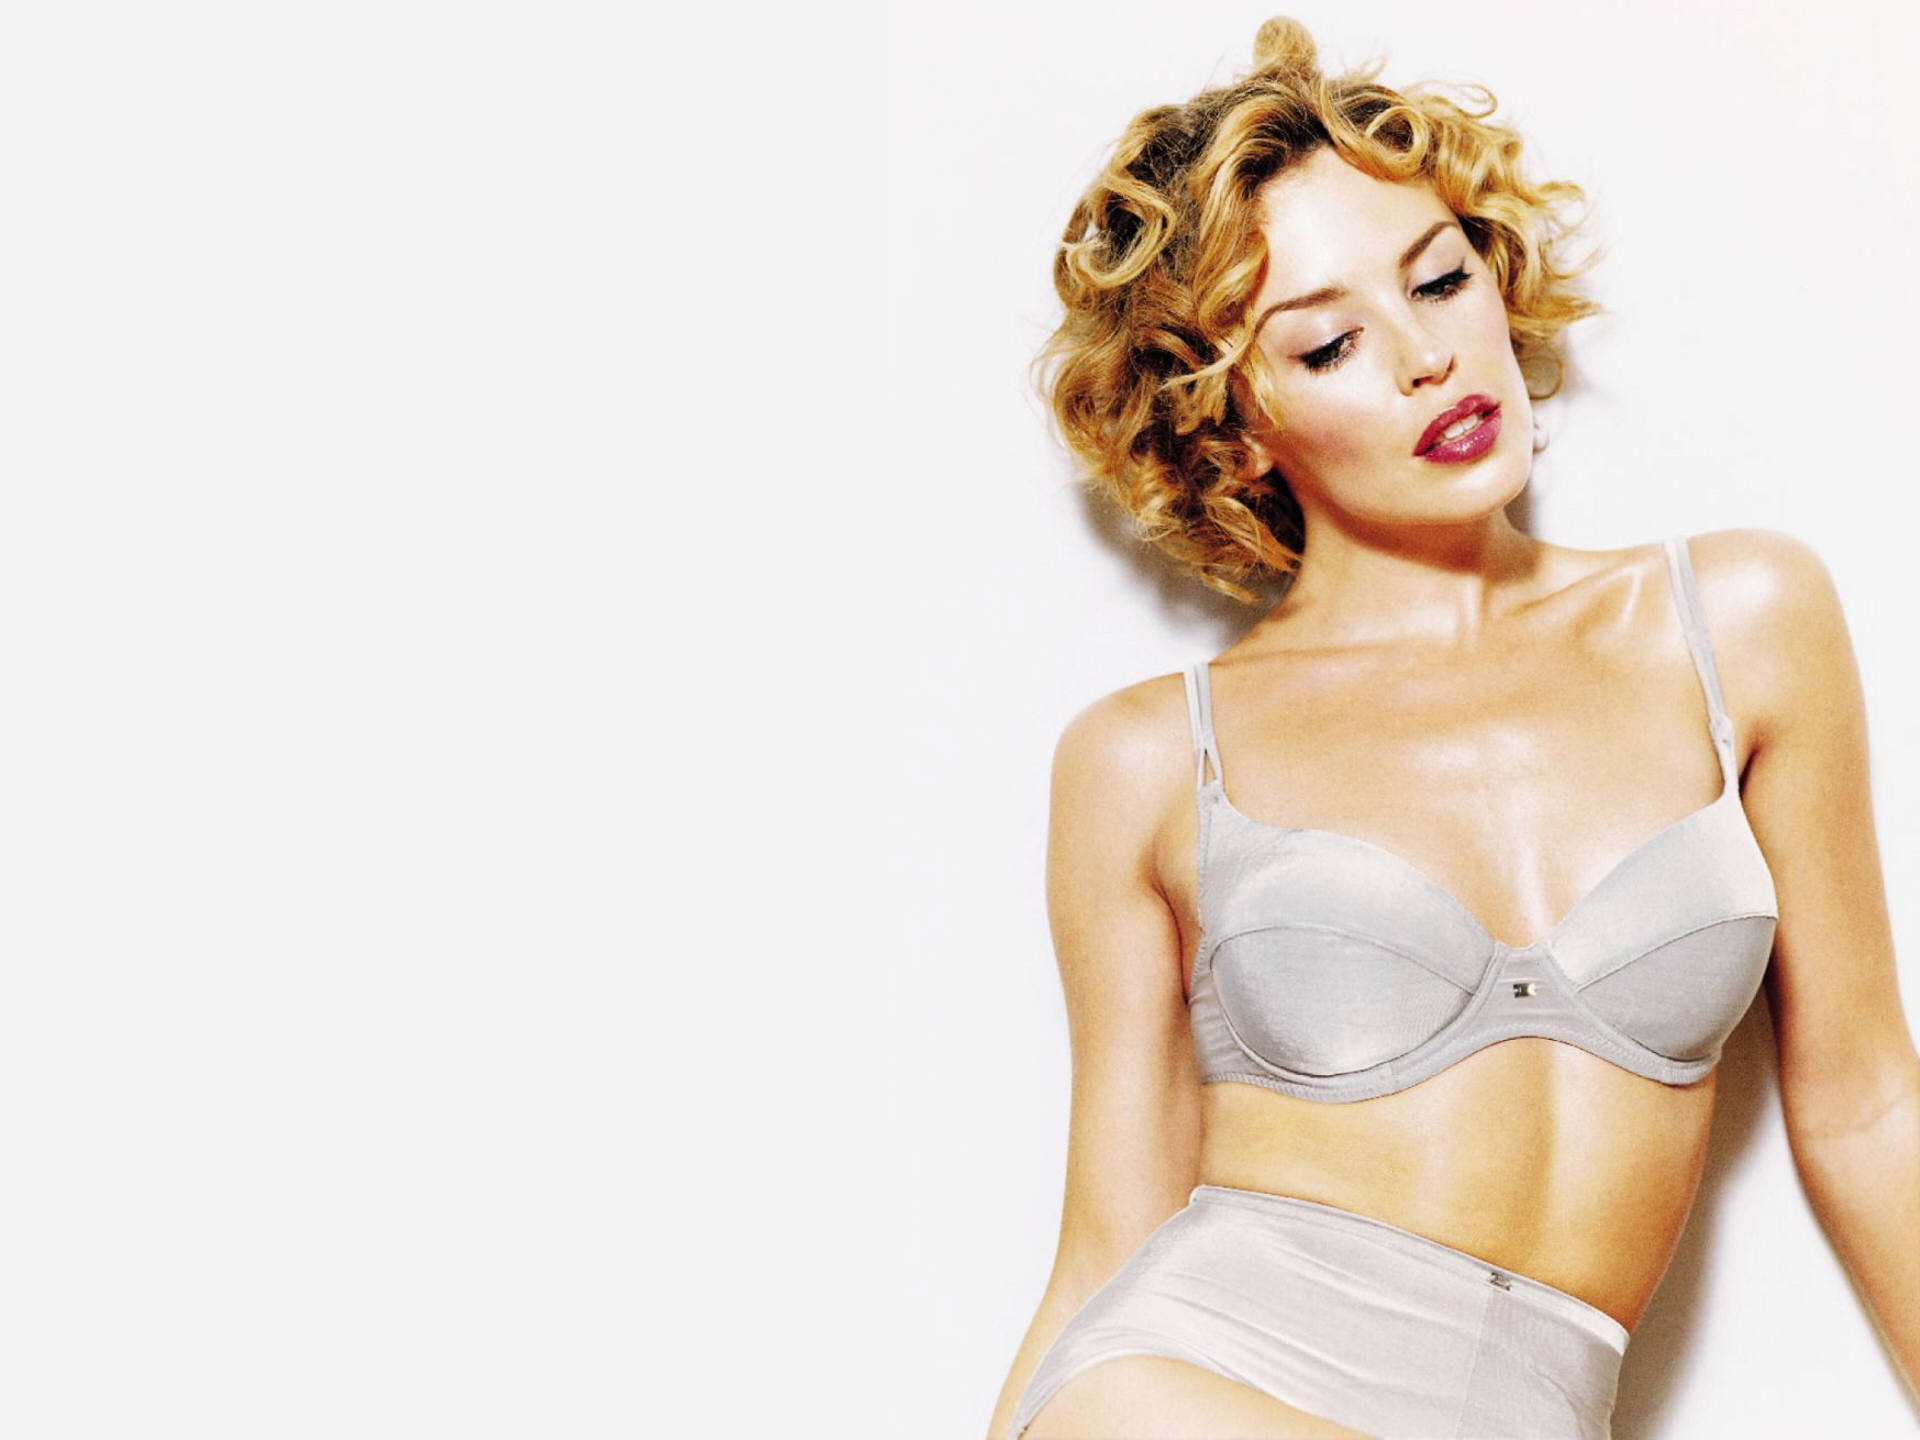 29291_Kylie_Minogue_133_123_1169lo.jpg